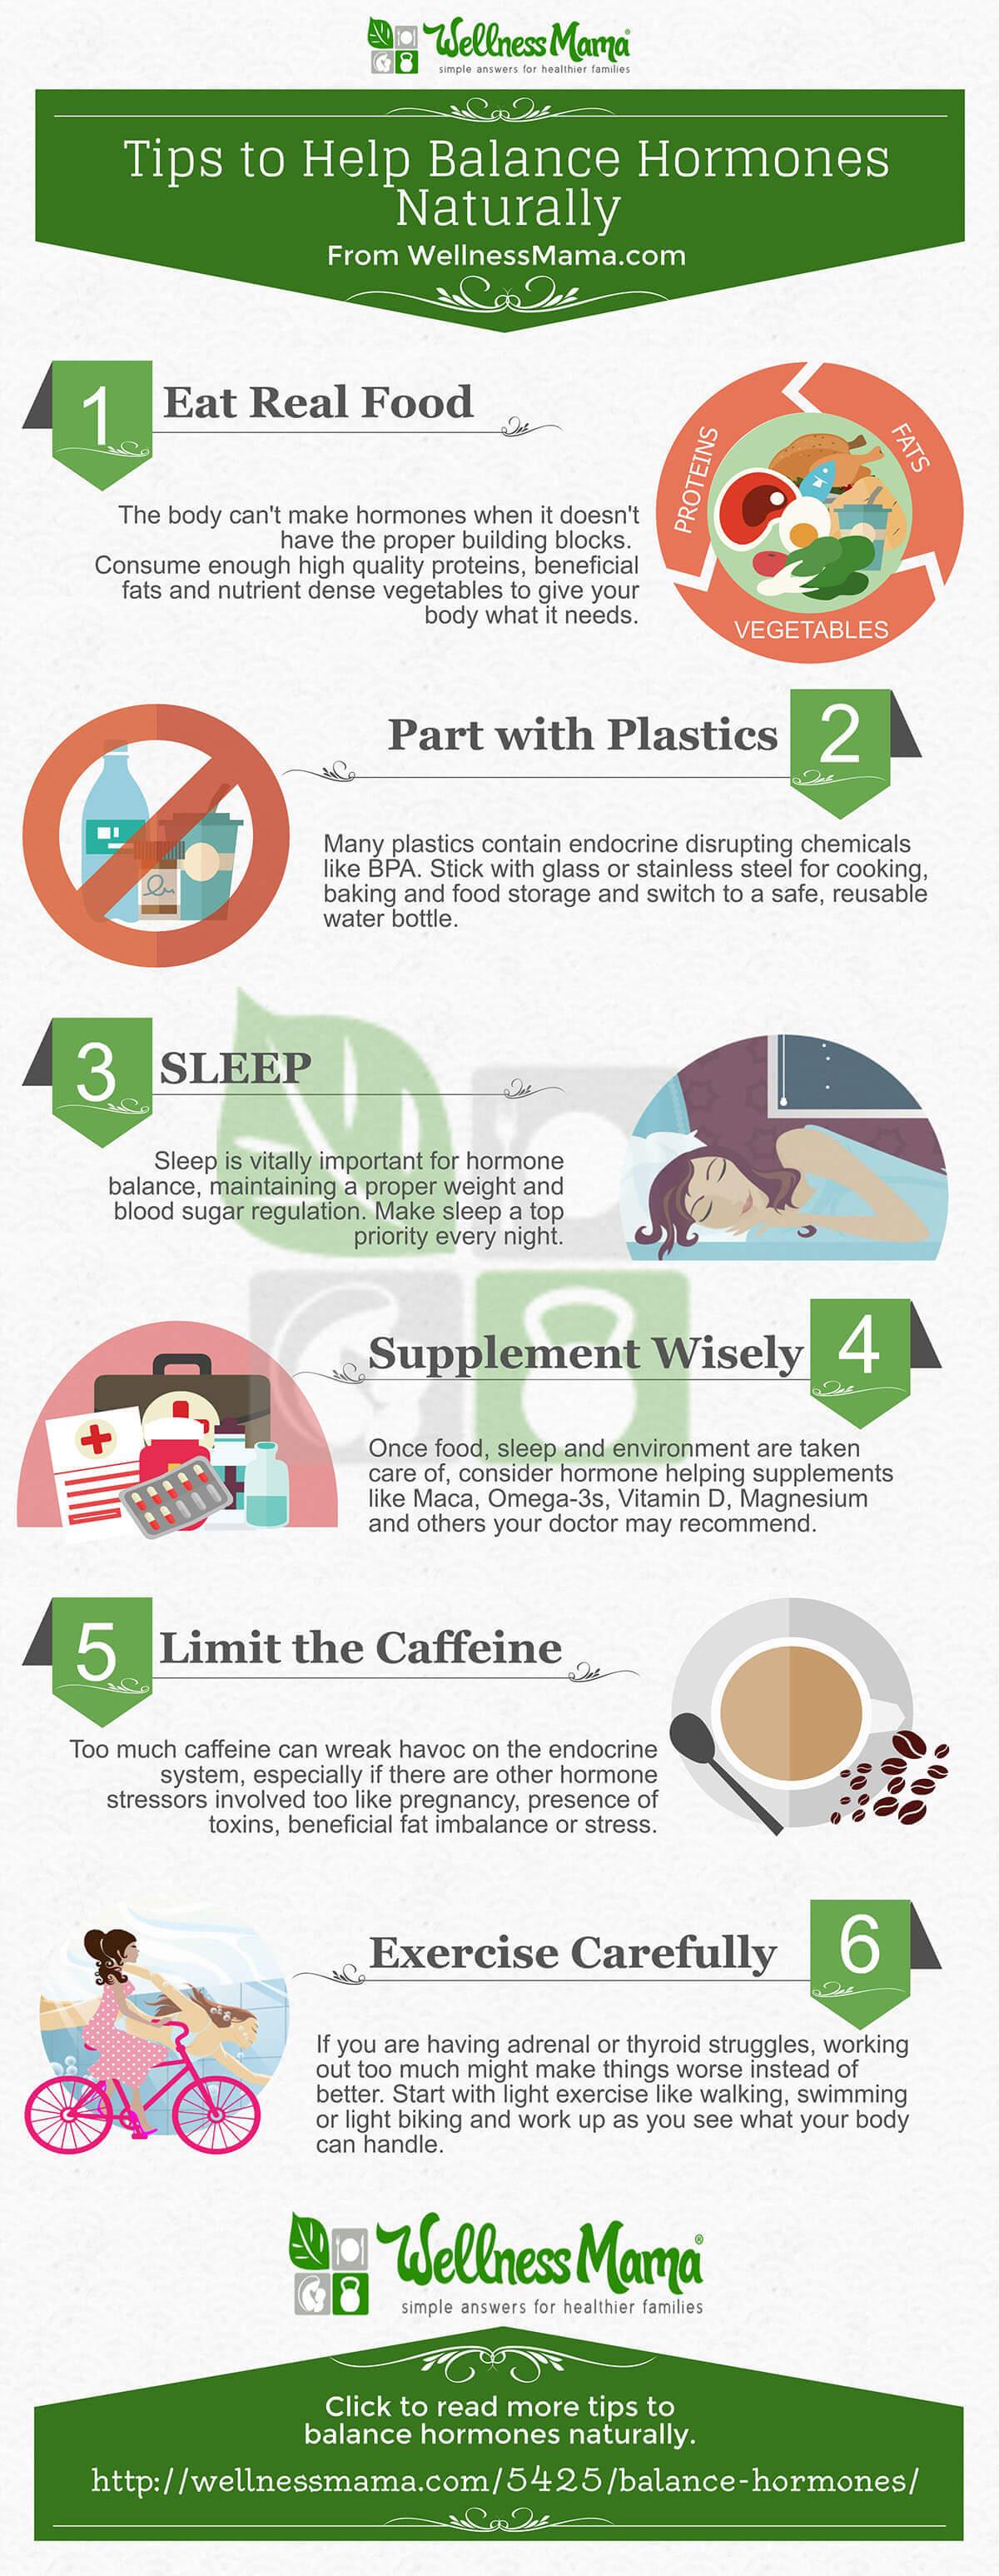 Ways To Balance Hormones Naturally